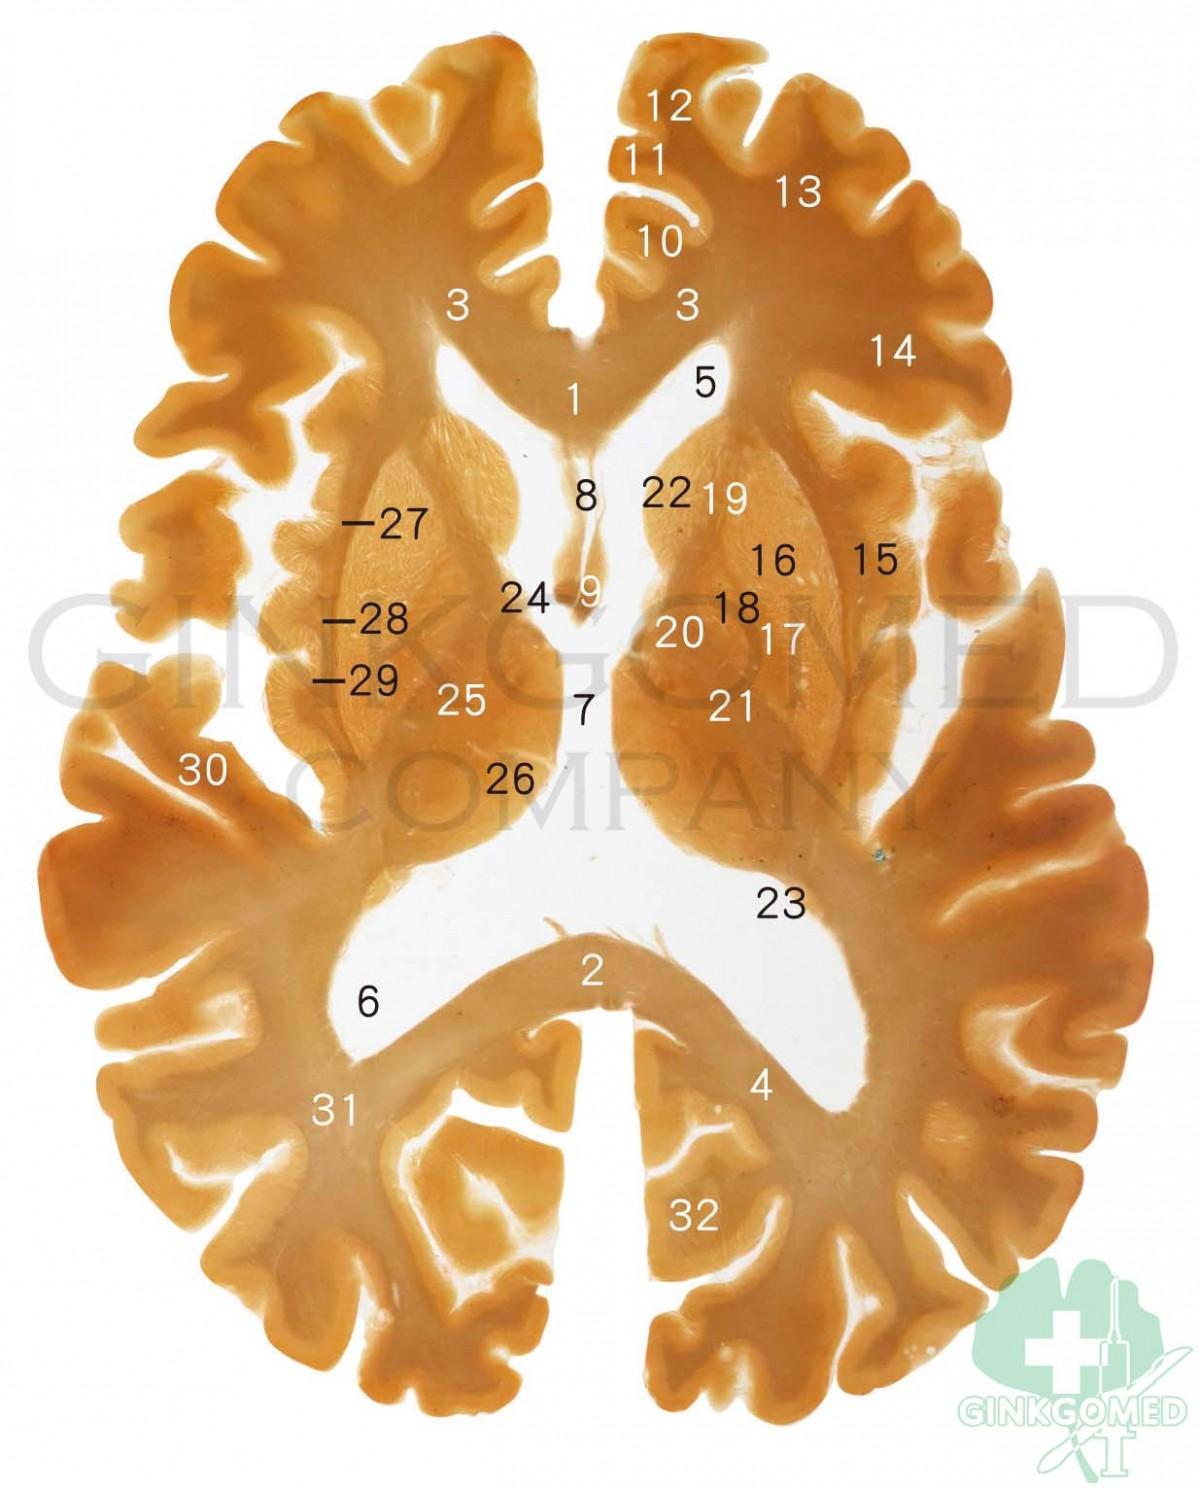 GM-BSD002 Acrylic Duplicates of Horizontal Brain Slices - Head, Neck ...